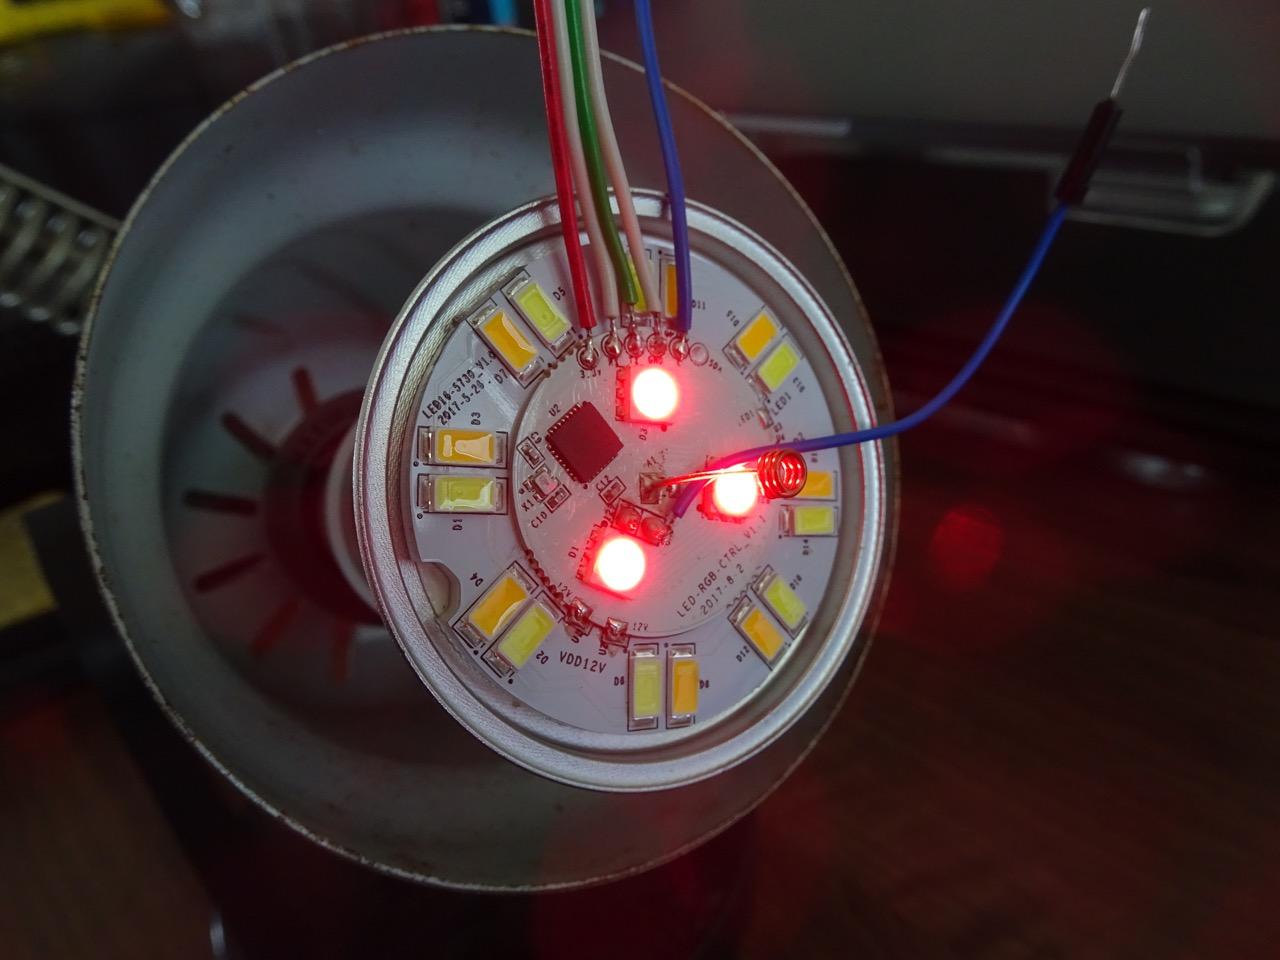 Hacking the Sonoff B1 WiFi LED bulb to run custom firmware